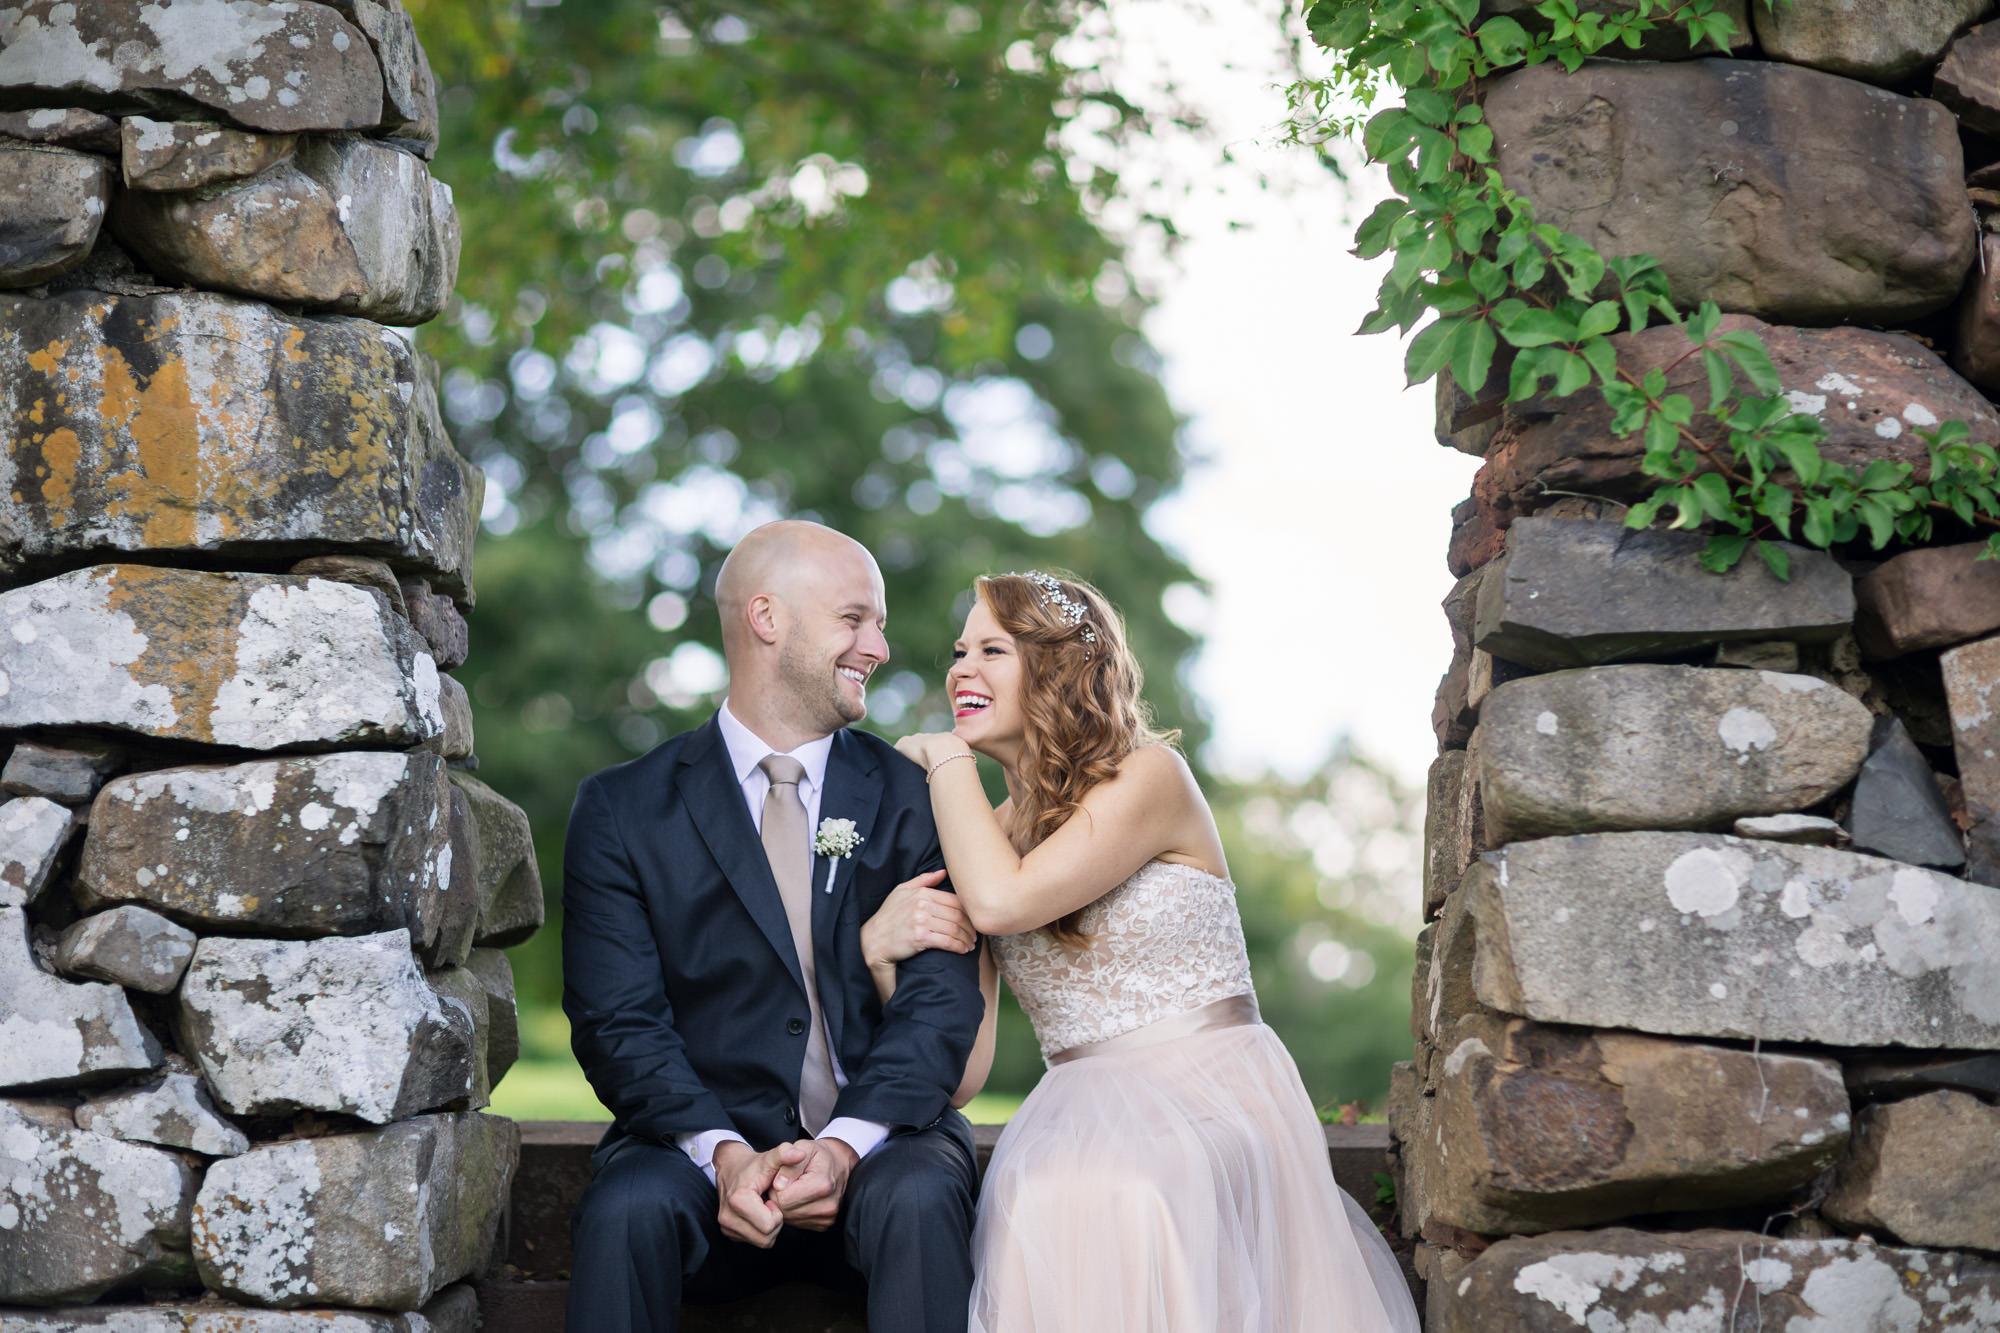 hill-stead museum wedding